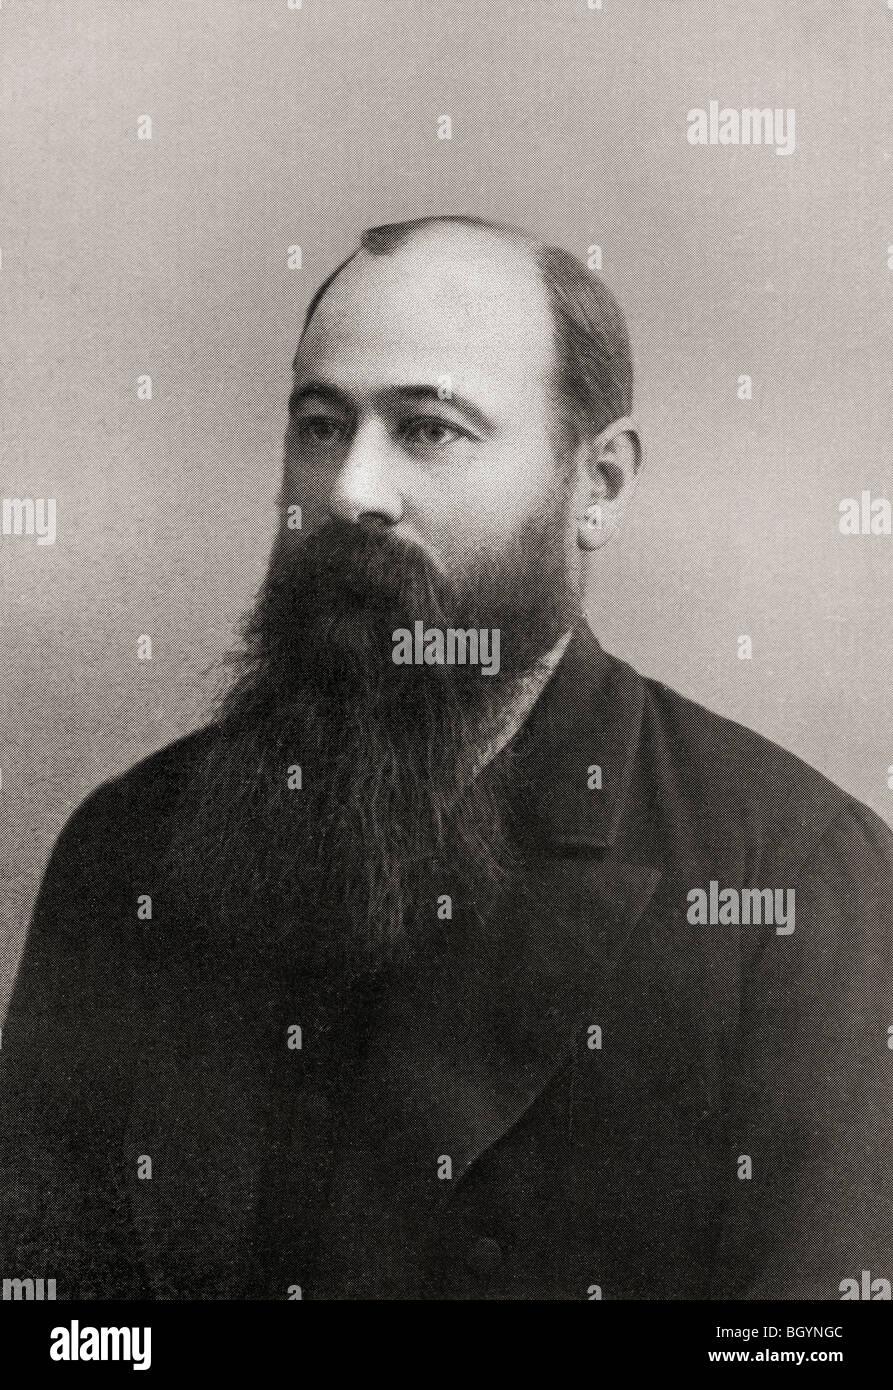 Martinus or Marthinus Theunis Steyn 1857 to 1916. South African lawyer, politician, statesman, president of  Orange Stock Photo